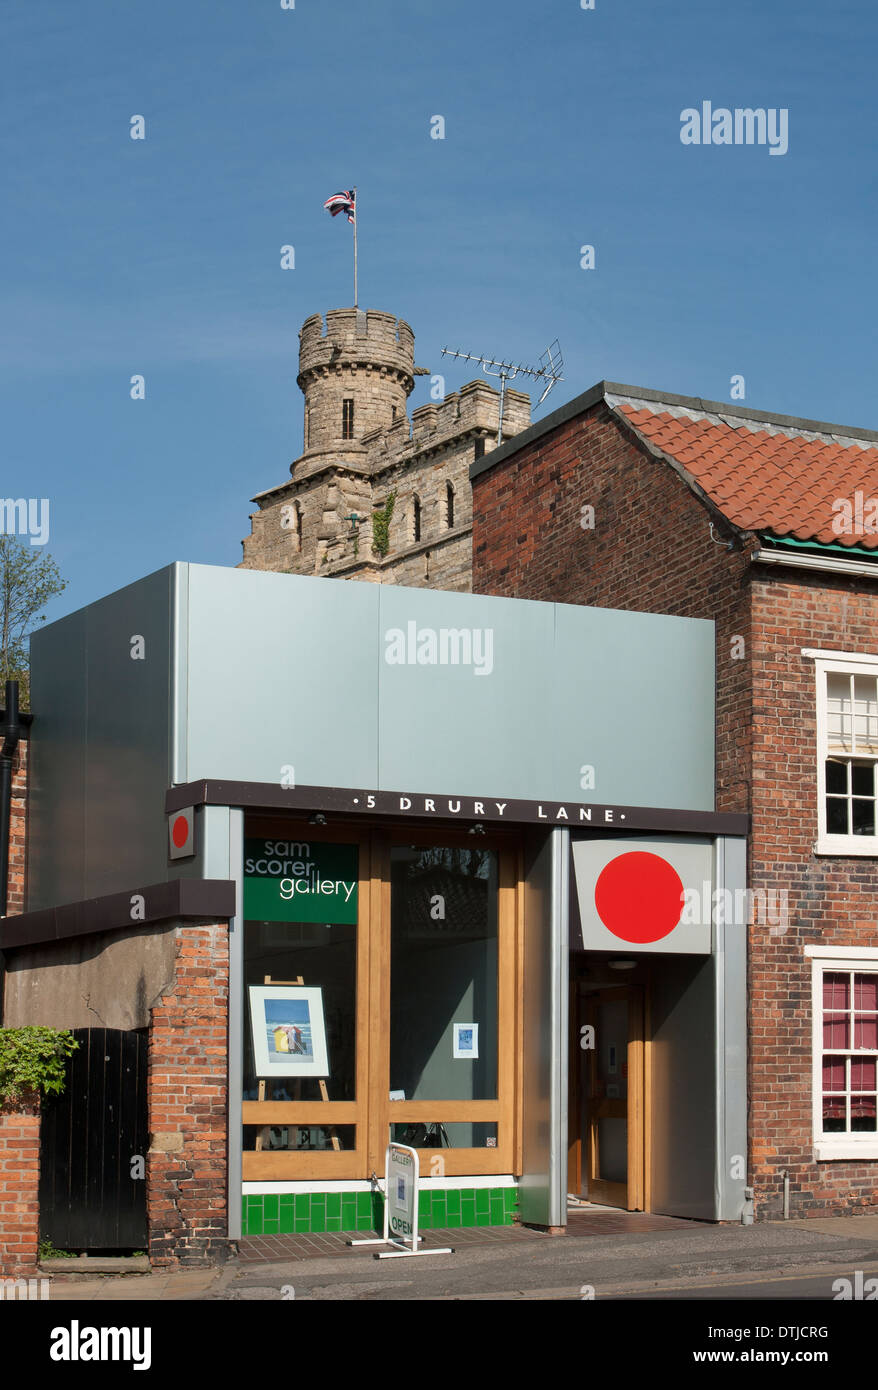 Sam Scorer Gallery, Lincoln, Lincolnshire, England UK - Stock Image